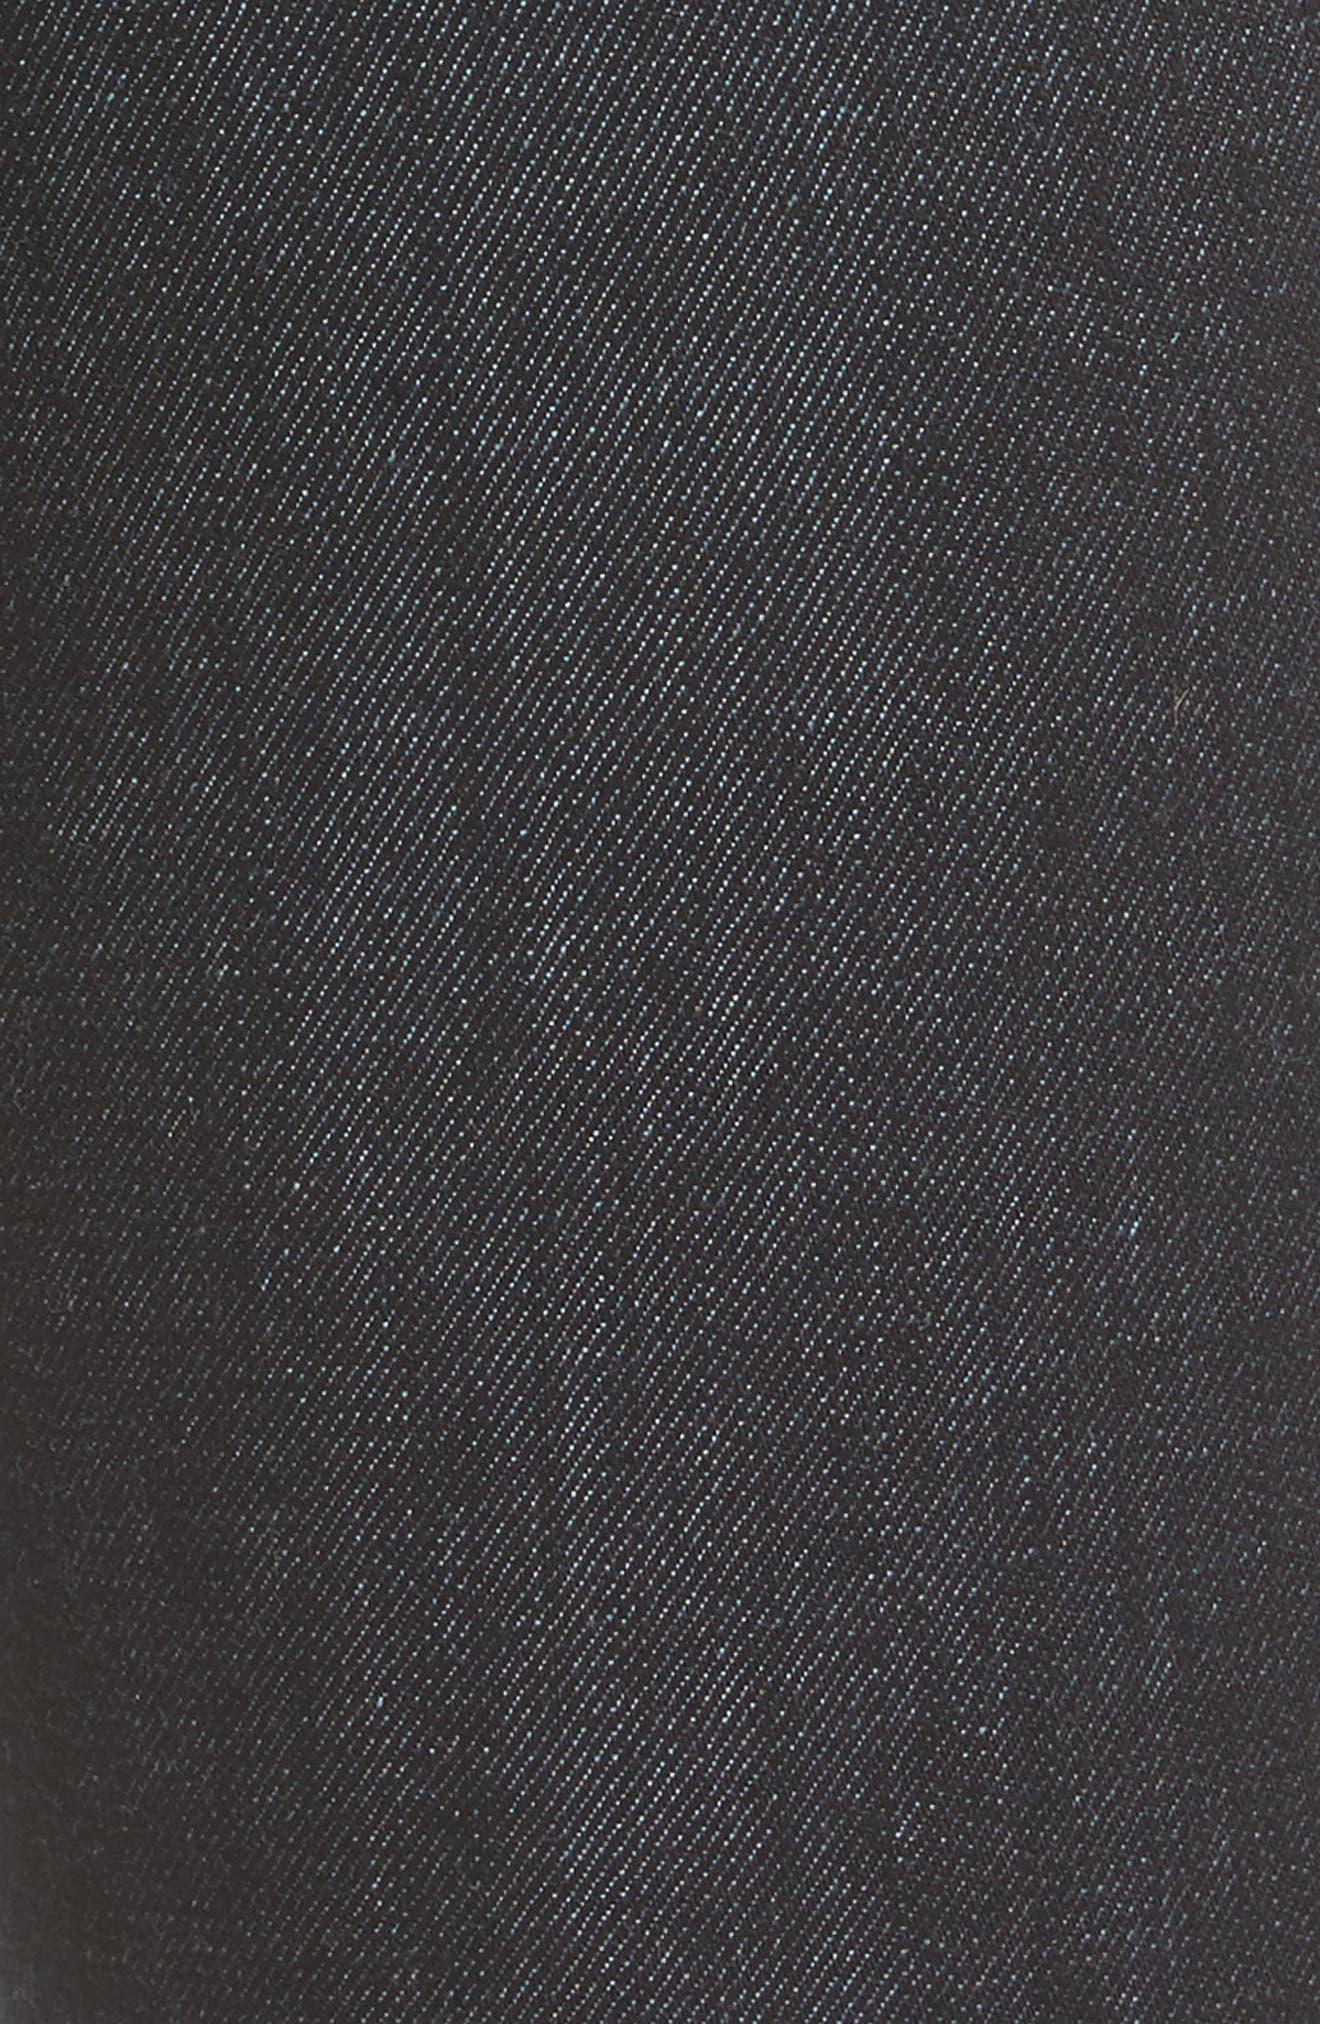 Nico Super Skinny Jeans,                             Alternate thumbnail 14, color,